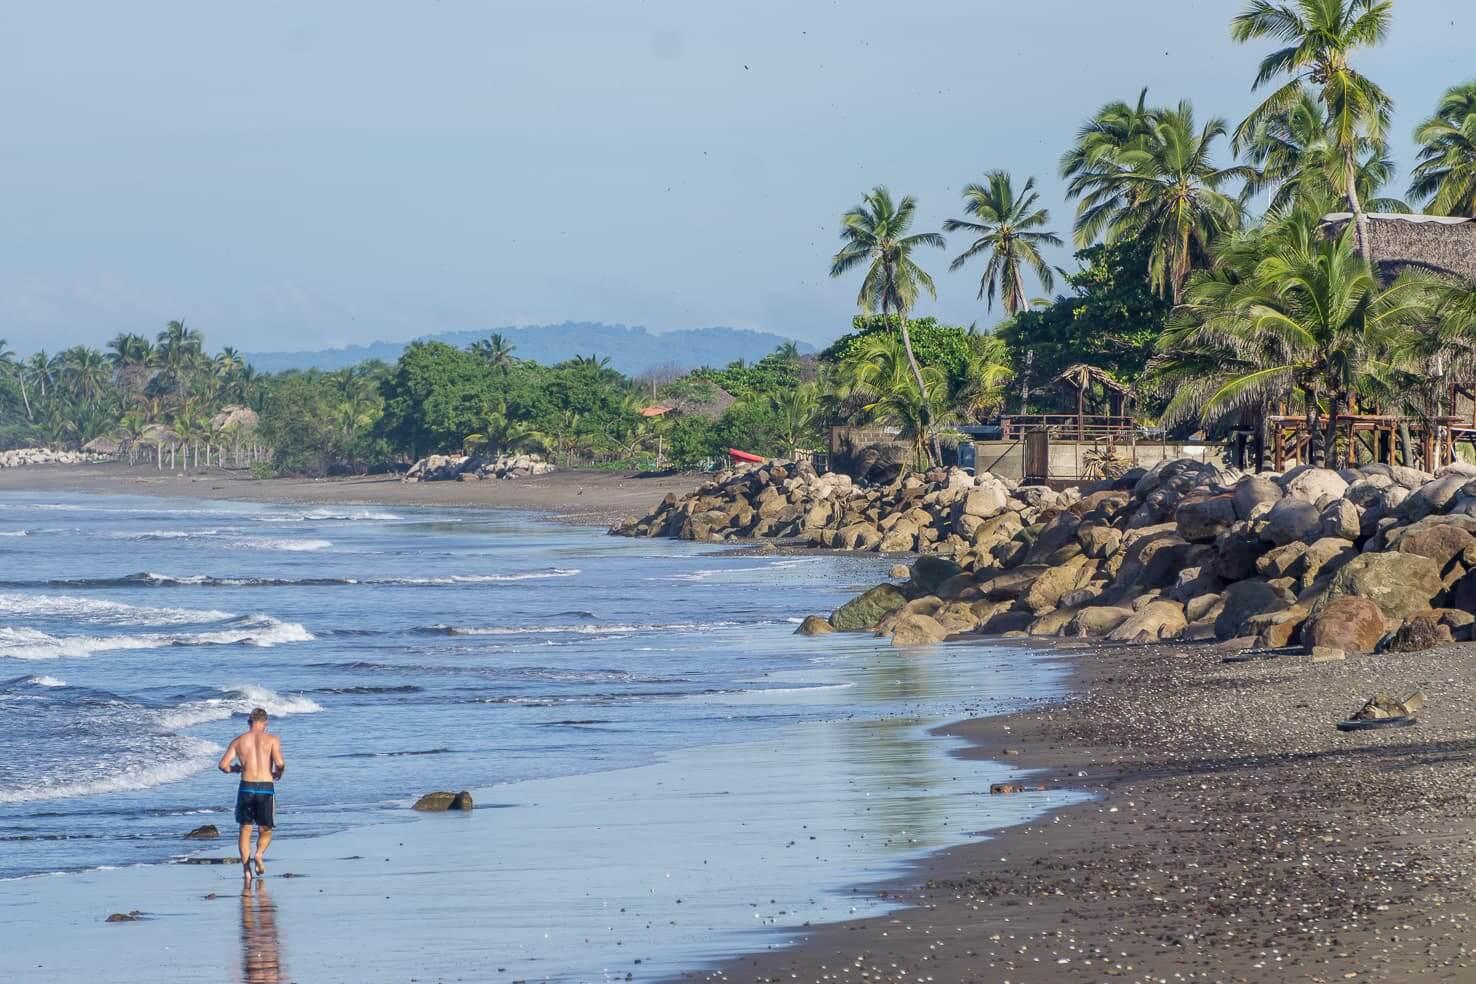 Jiquilillo, Nicaragua